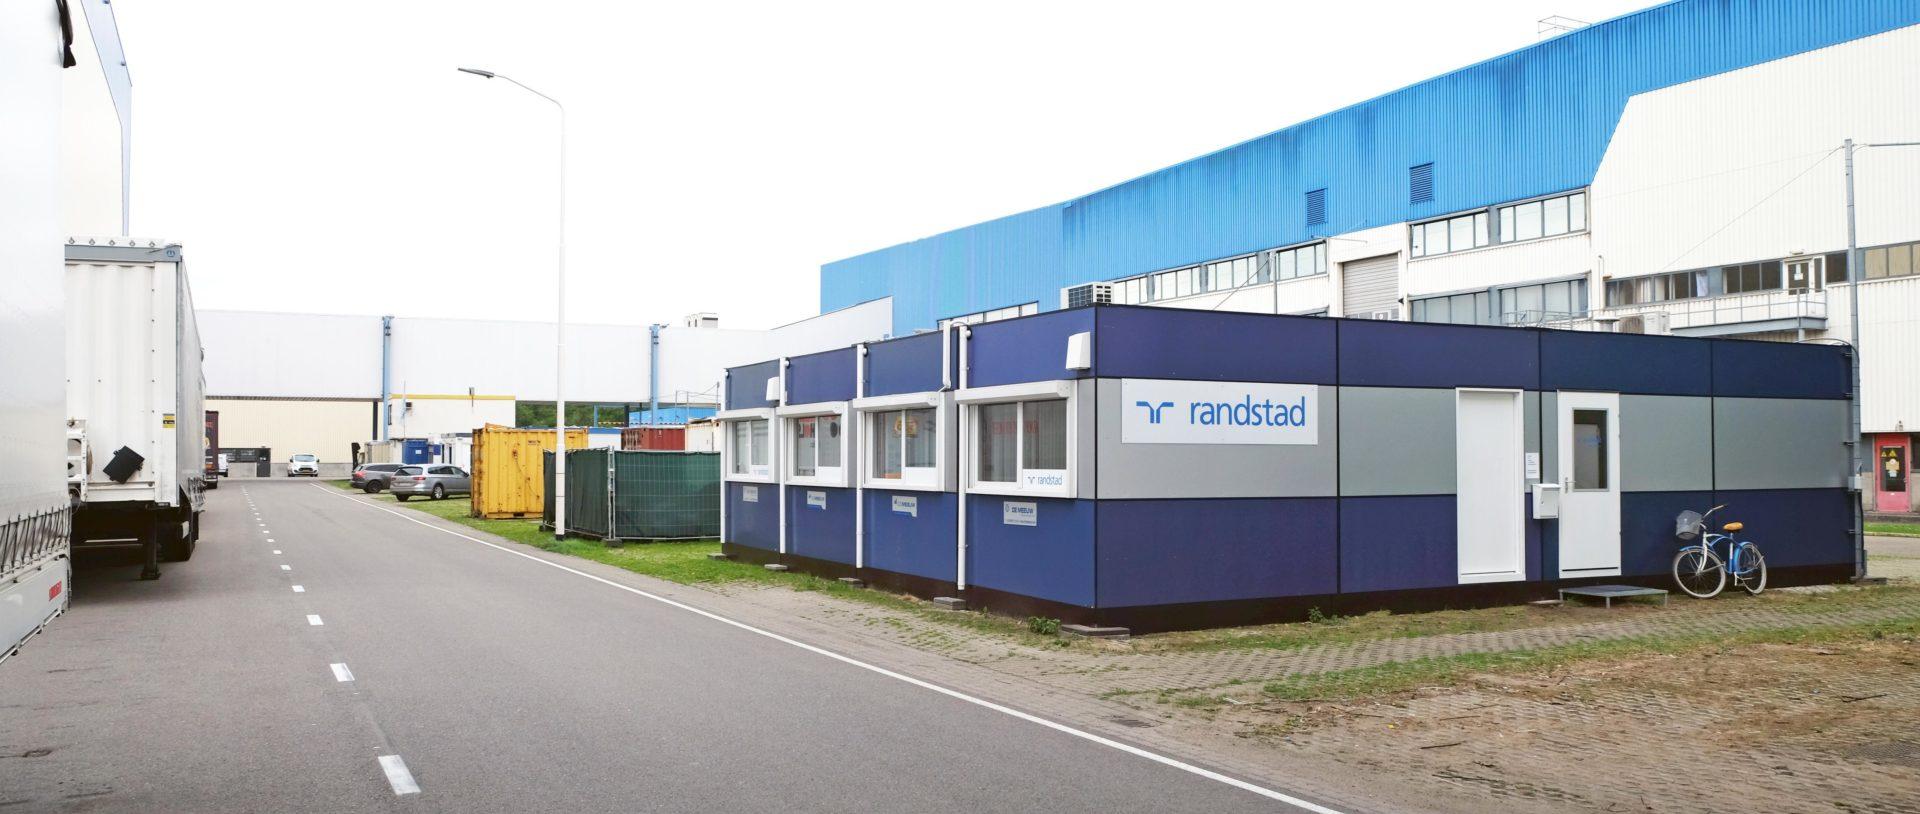 Randstad Born 1